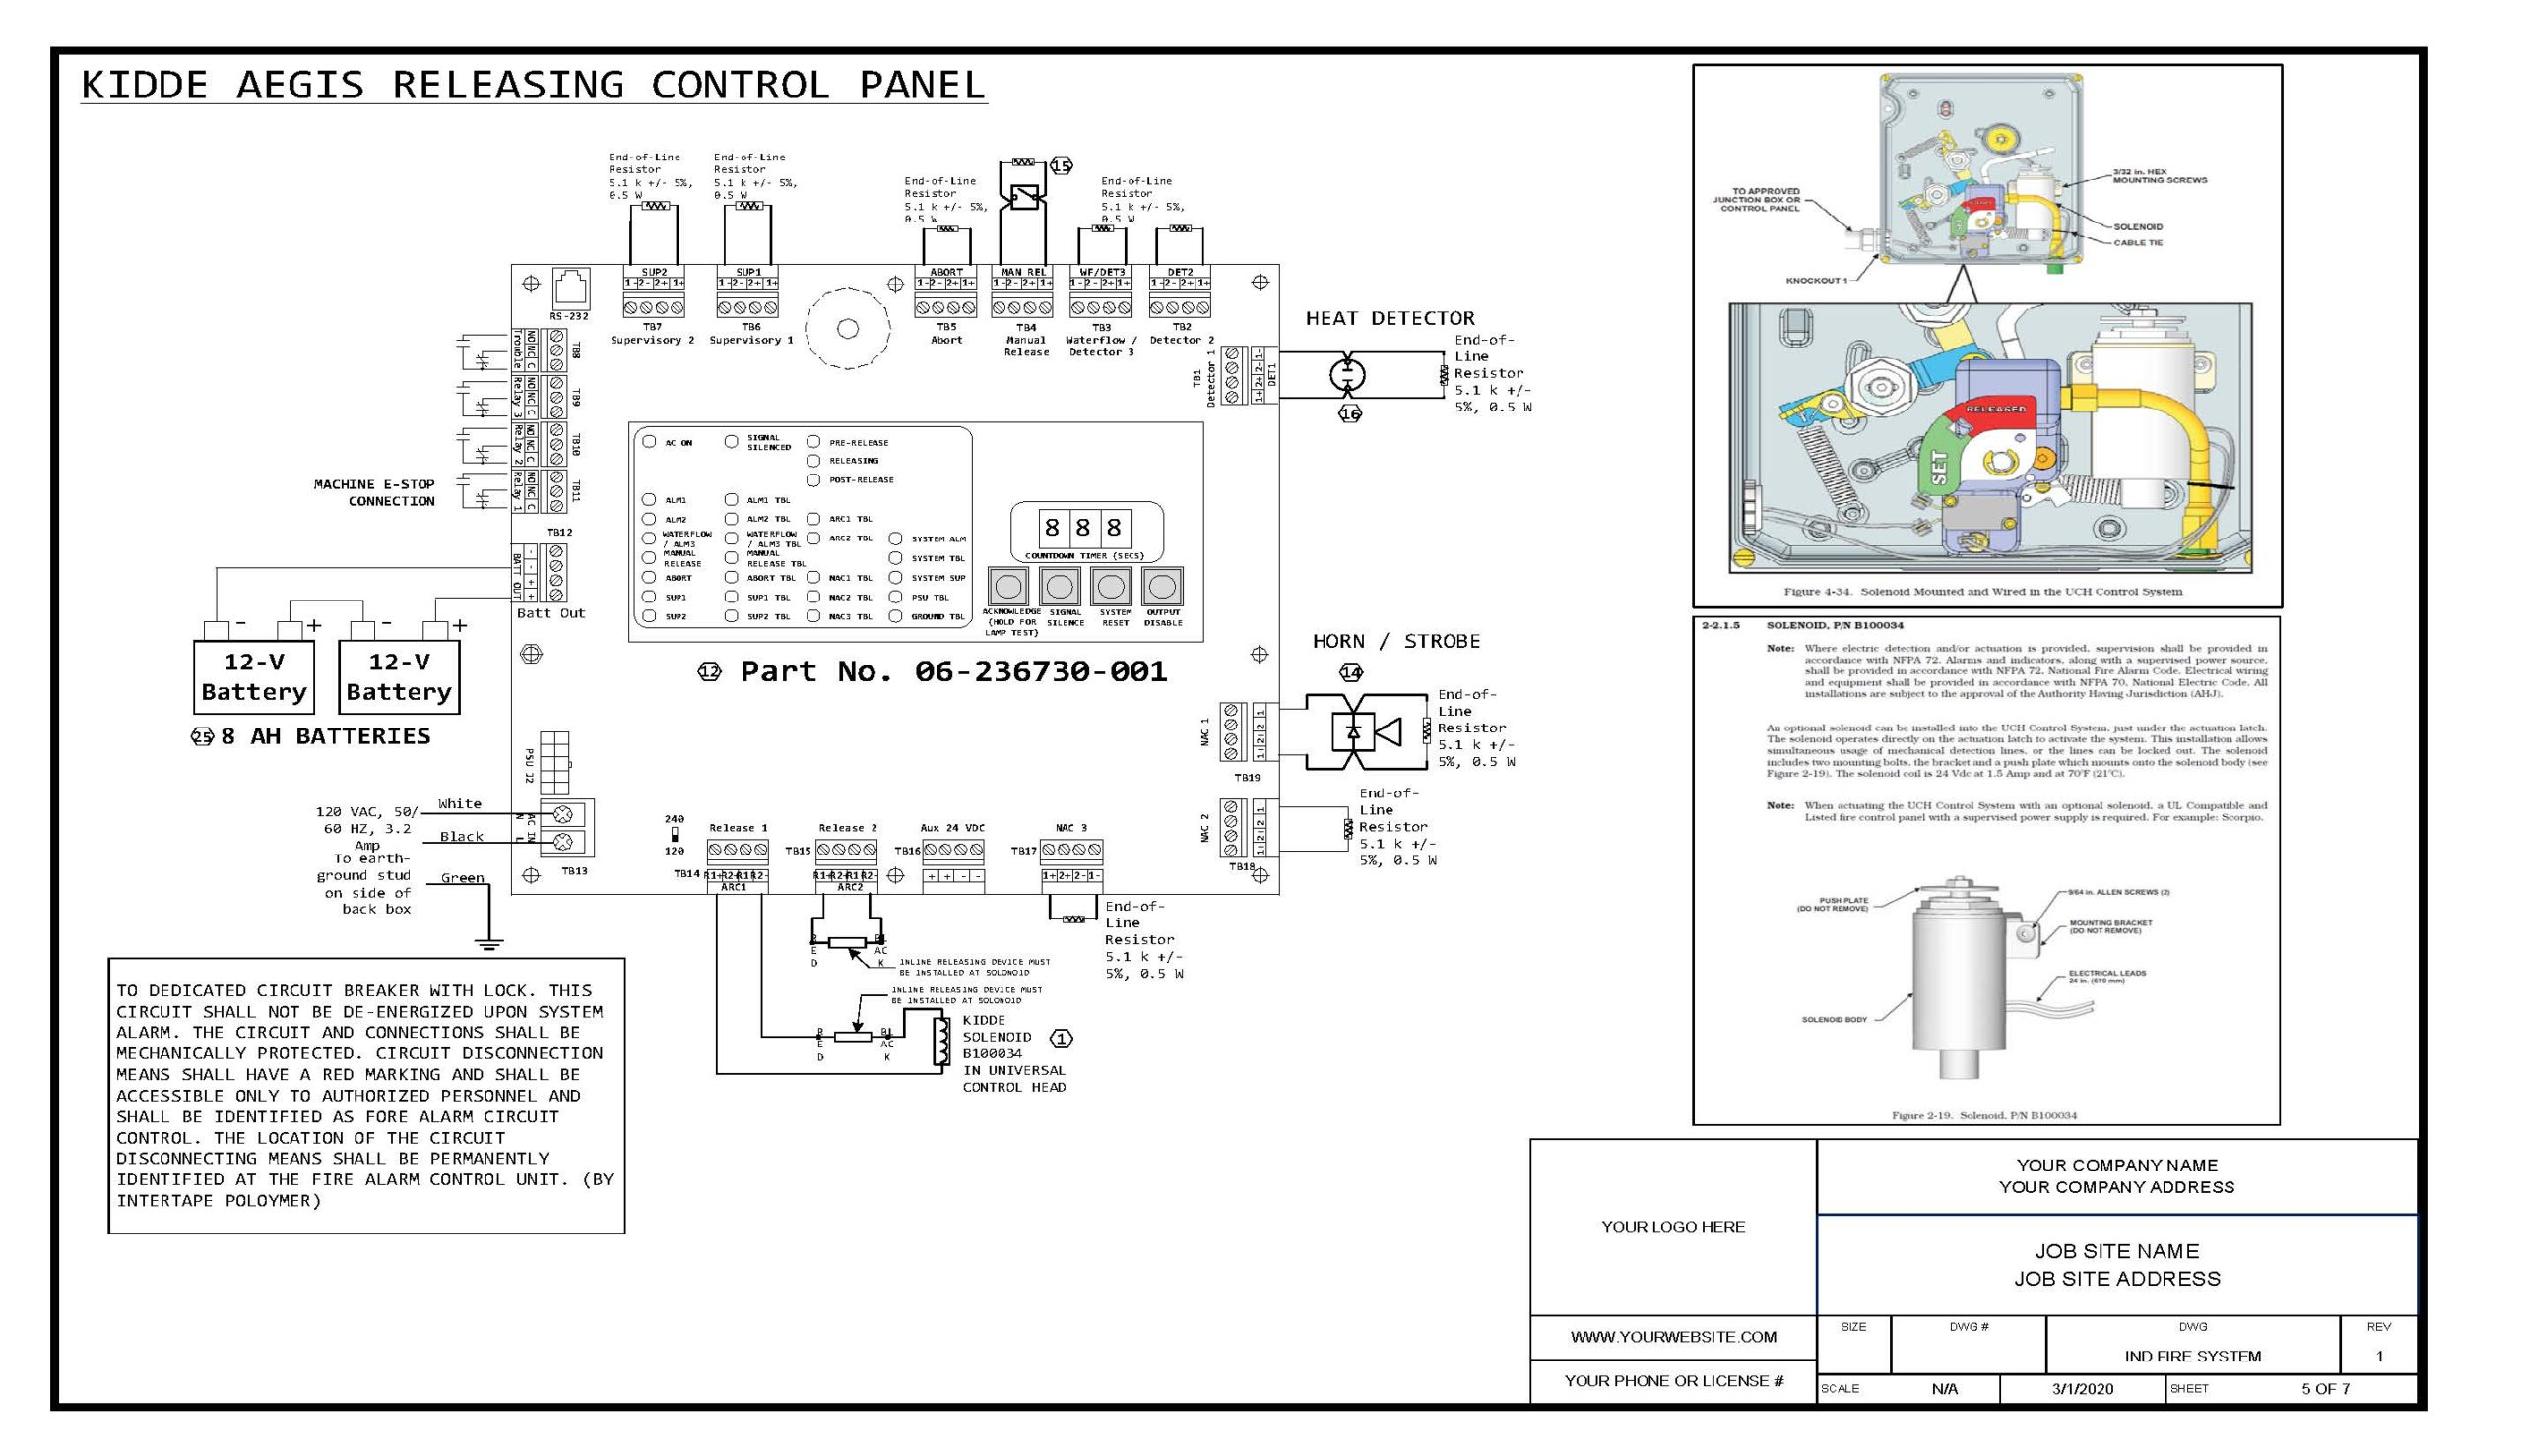 Sample Badger Panel Diagram Firesystemdrawings Llc